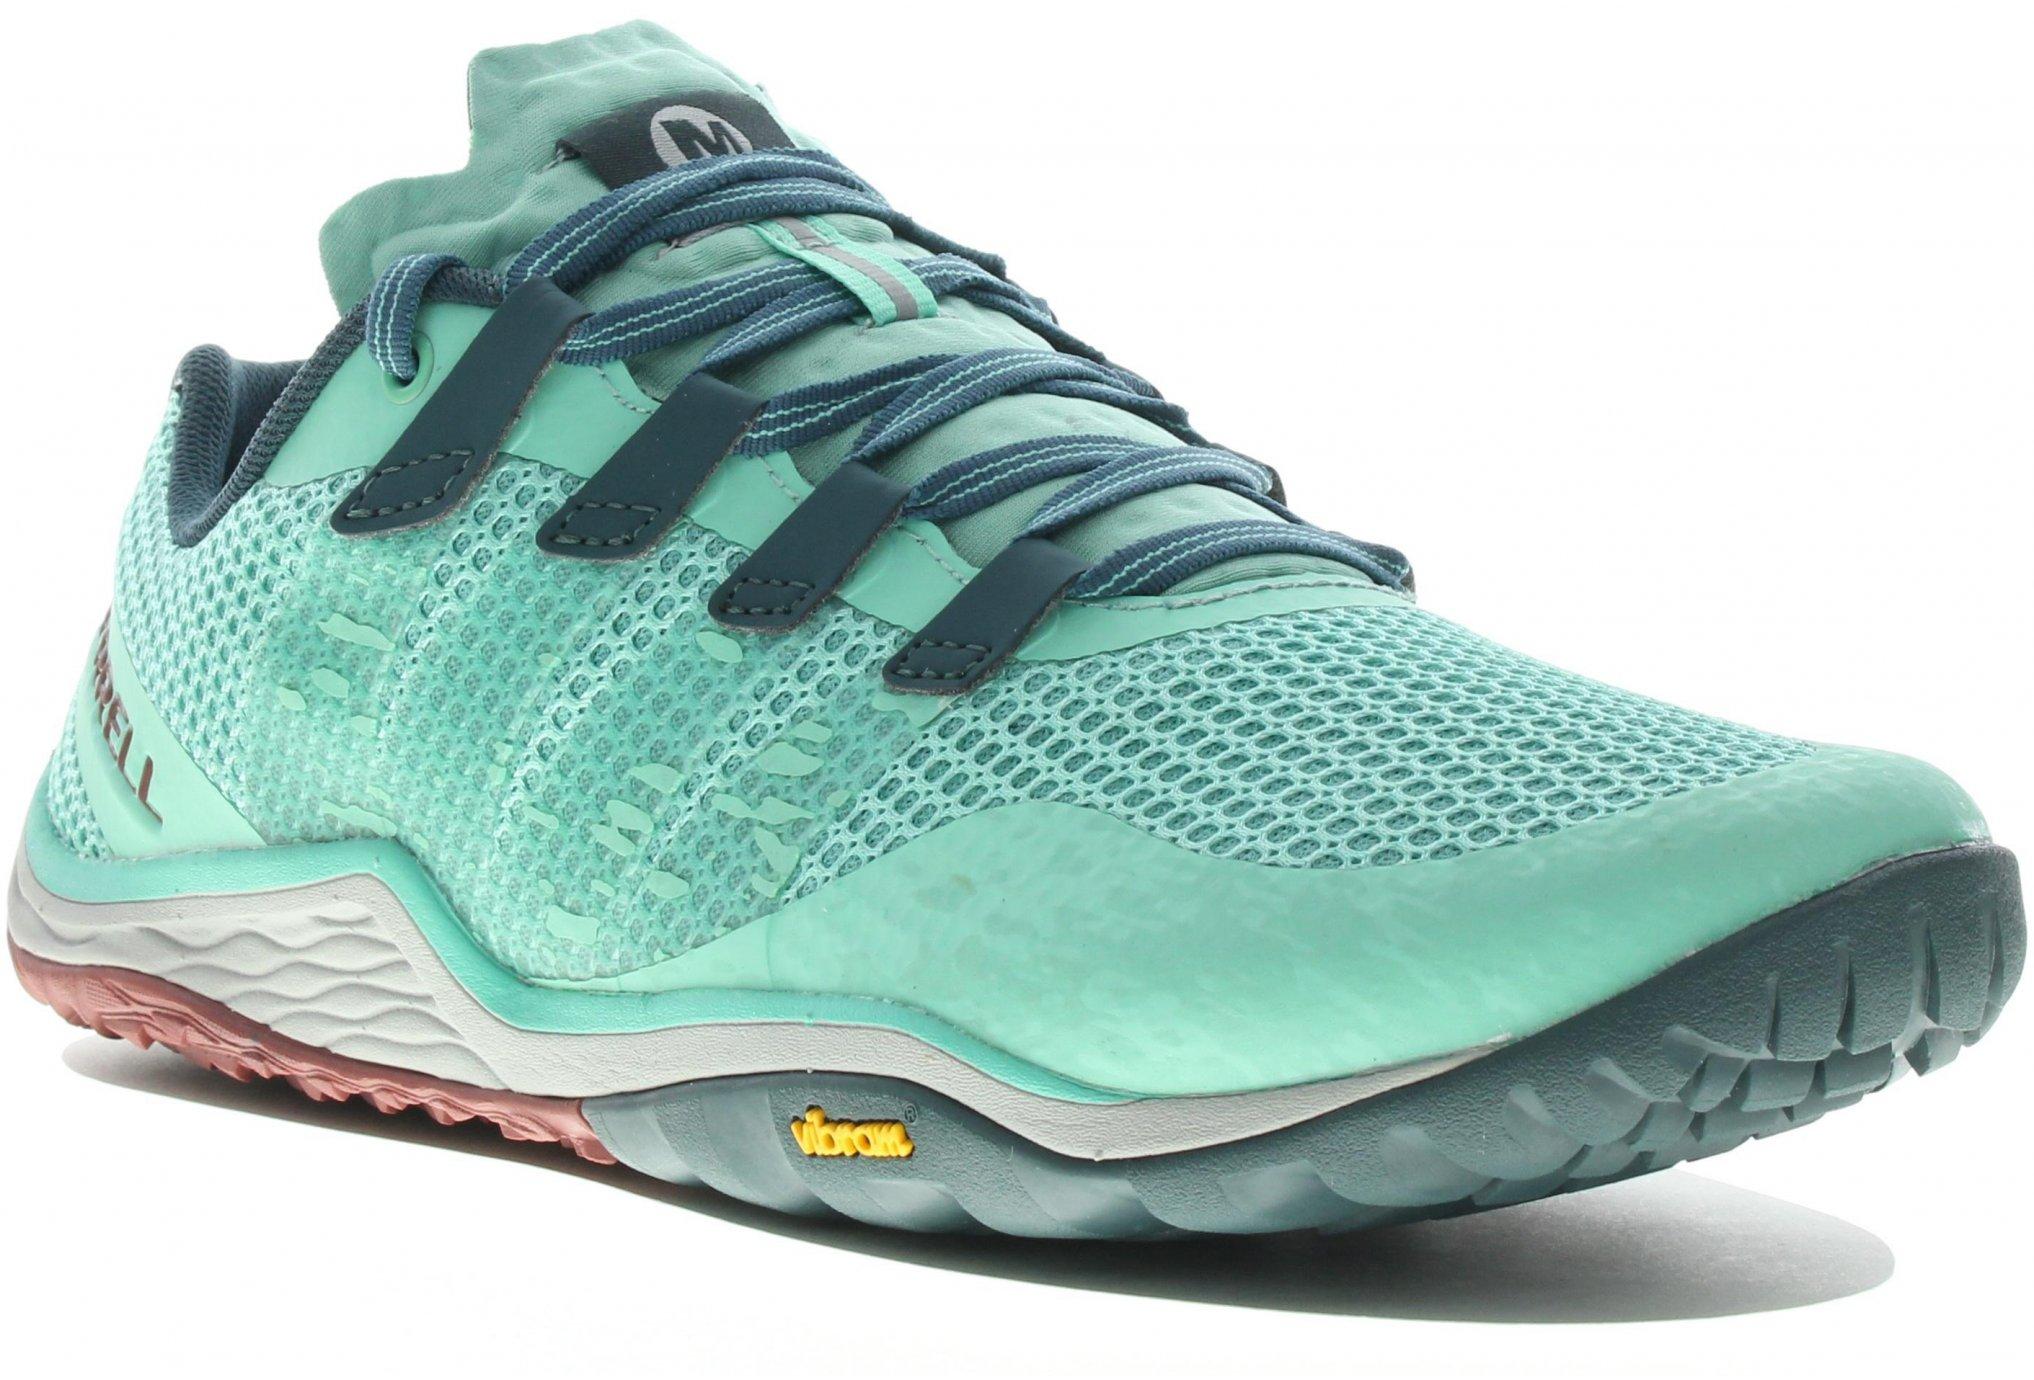 Merrell Trail Glove 5 W Chaussures running femme